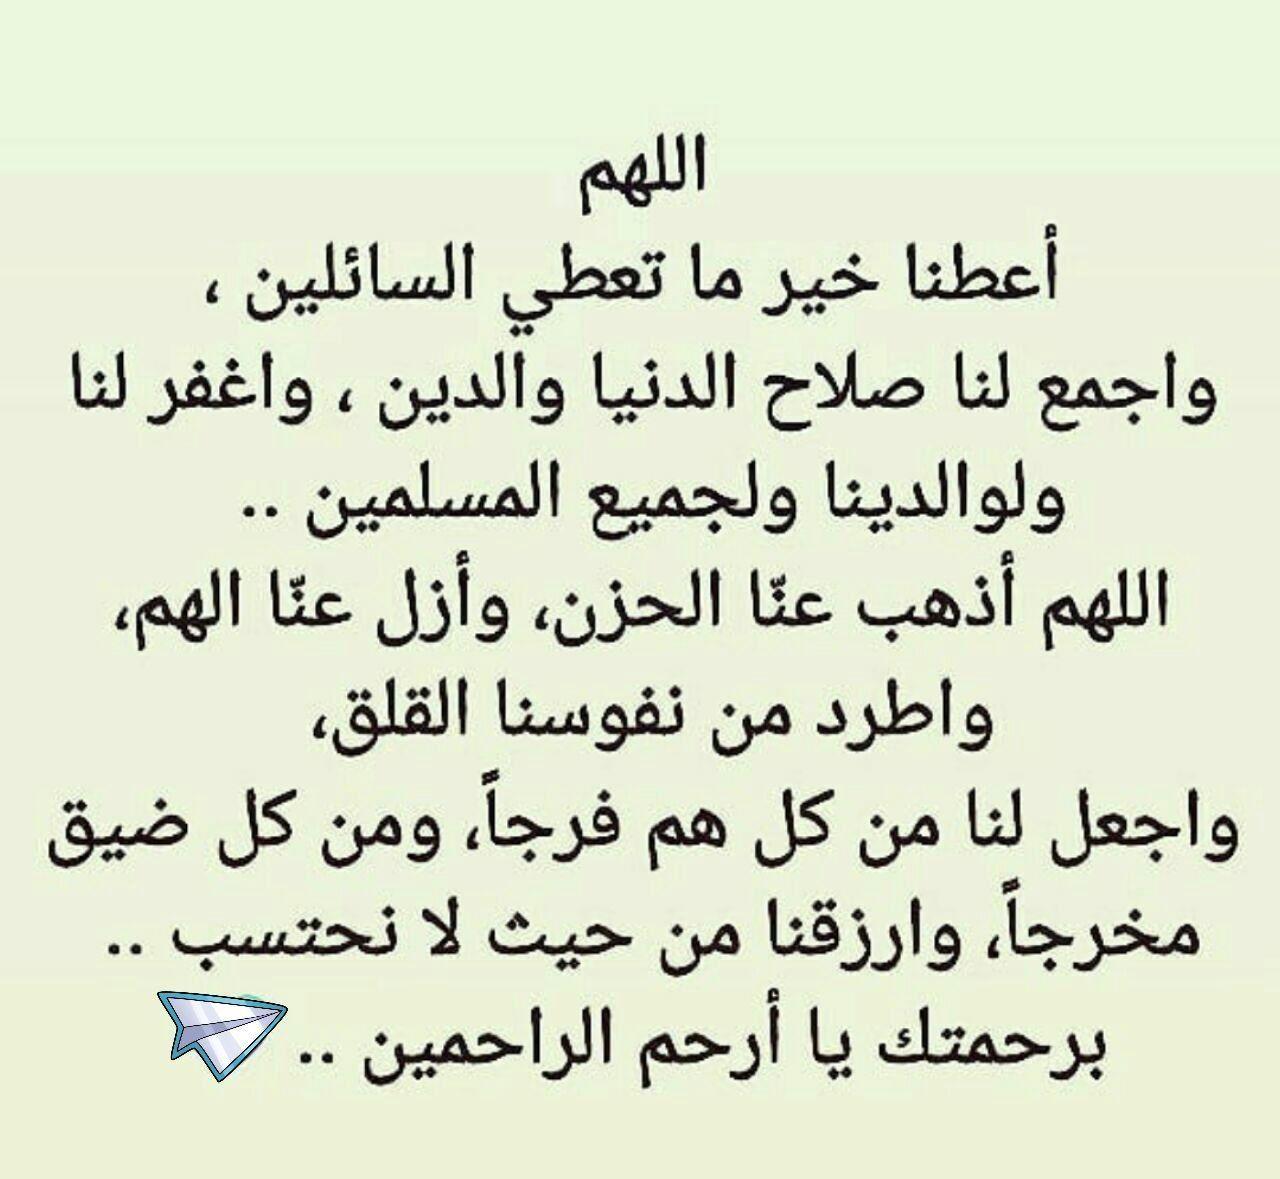 Pin By Marwa Amin On Duaa Islam Math Duaa Islam Islam